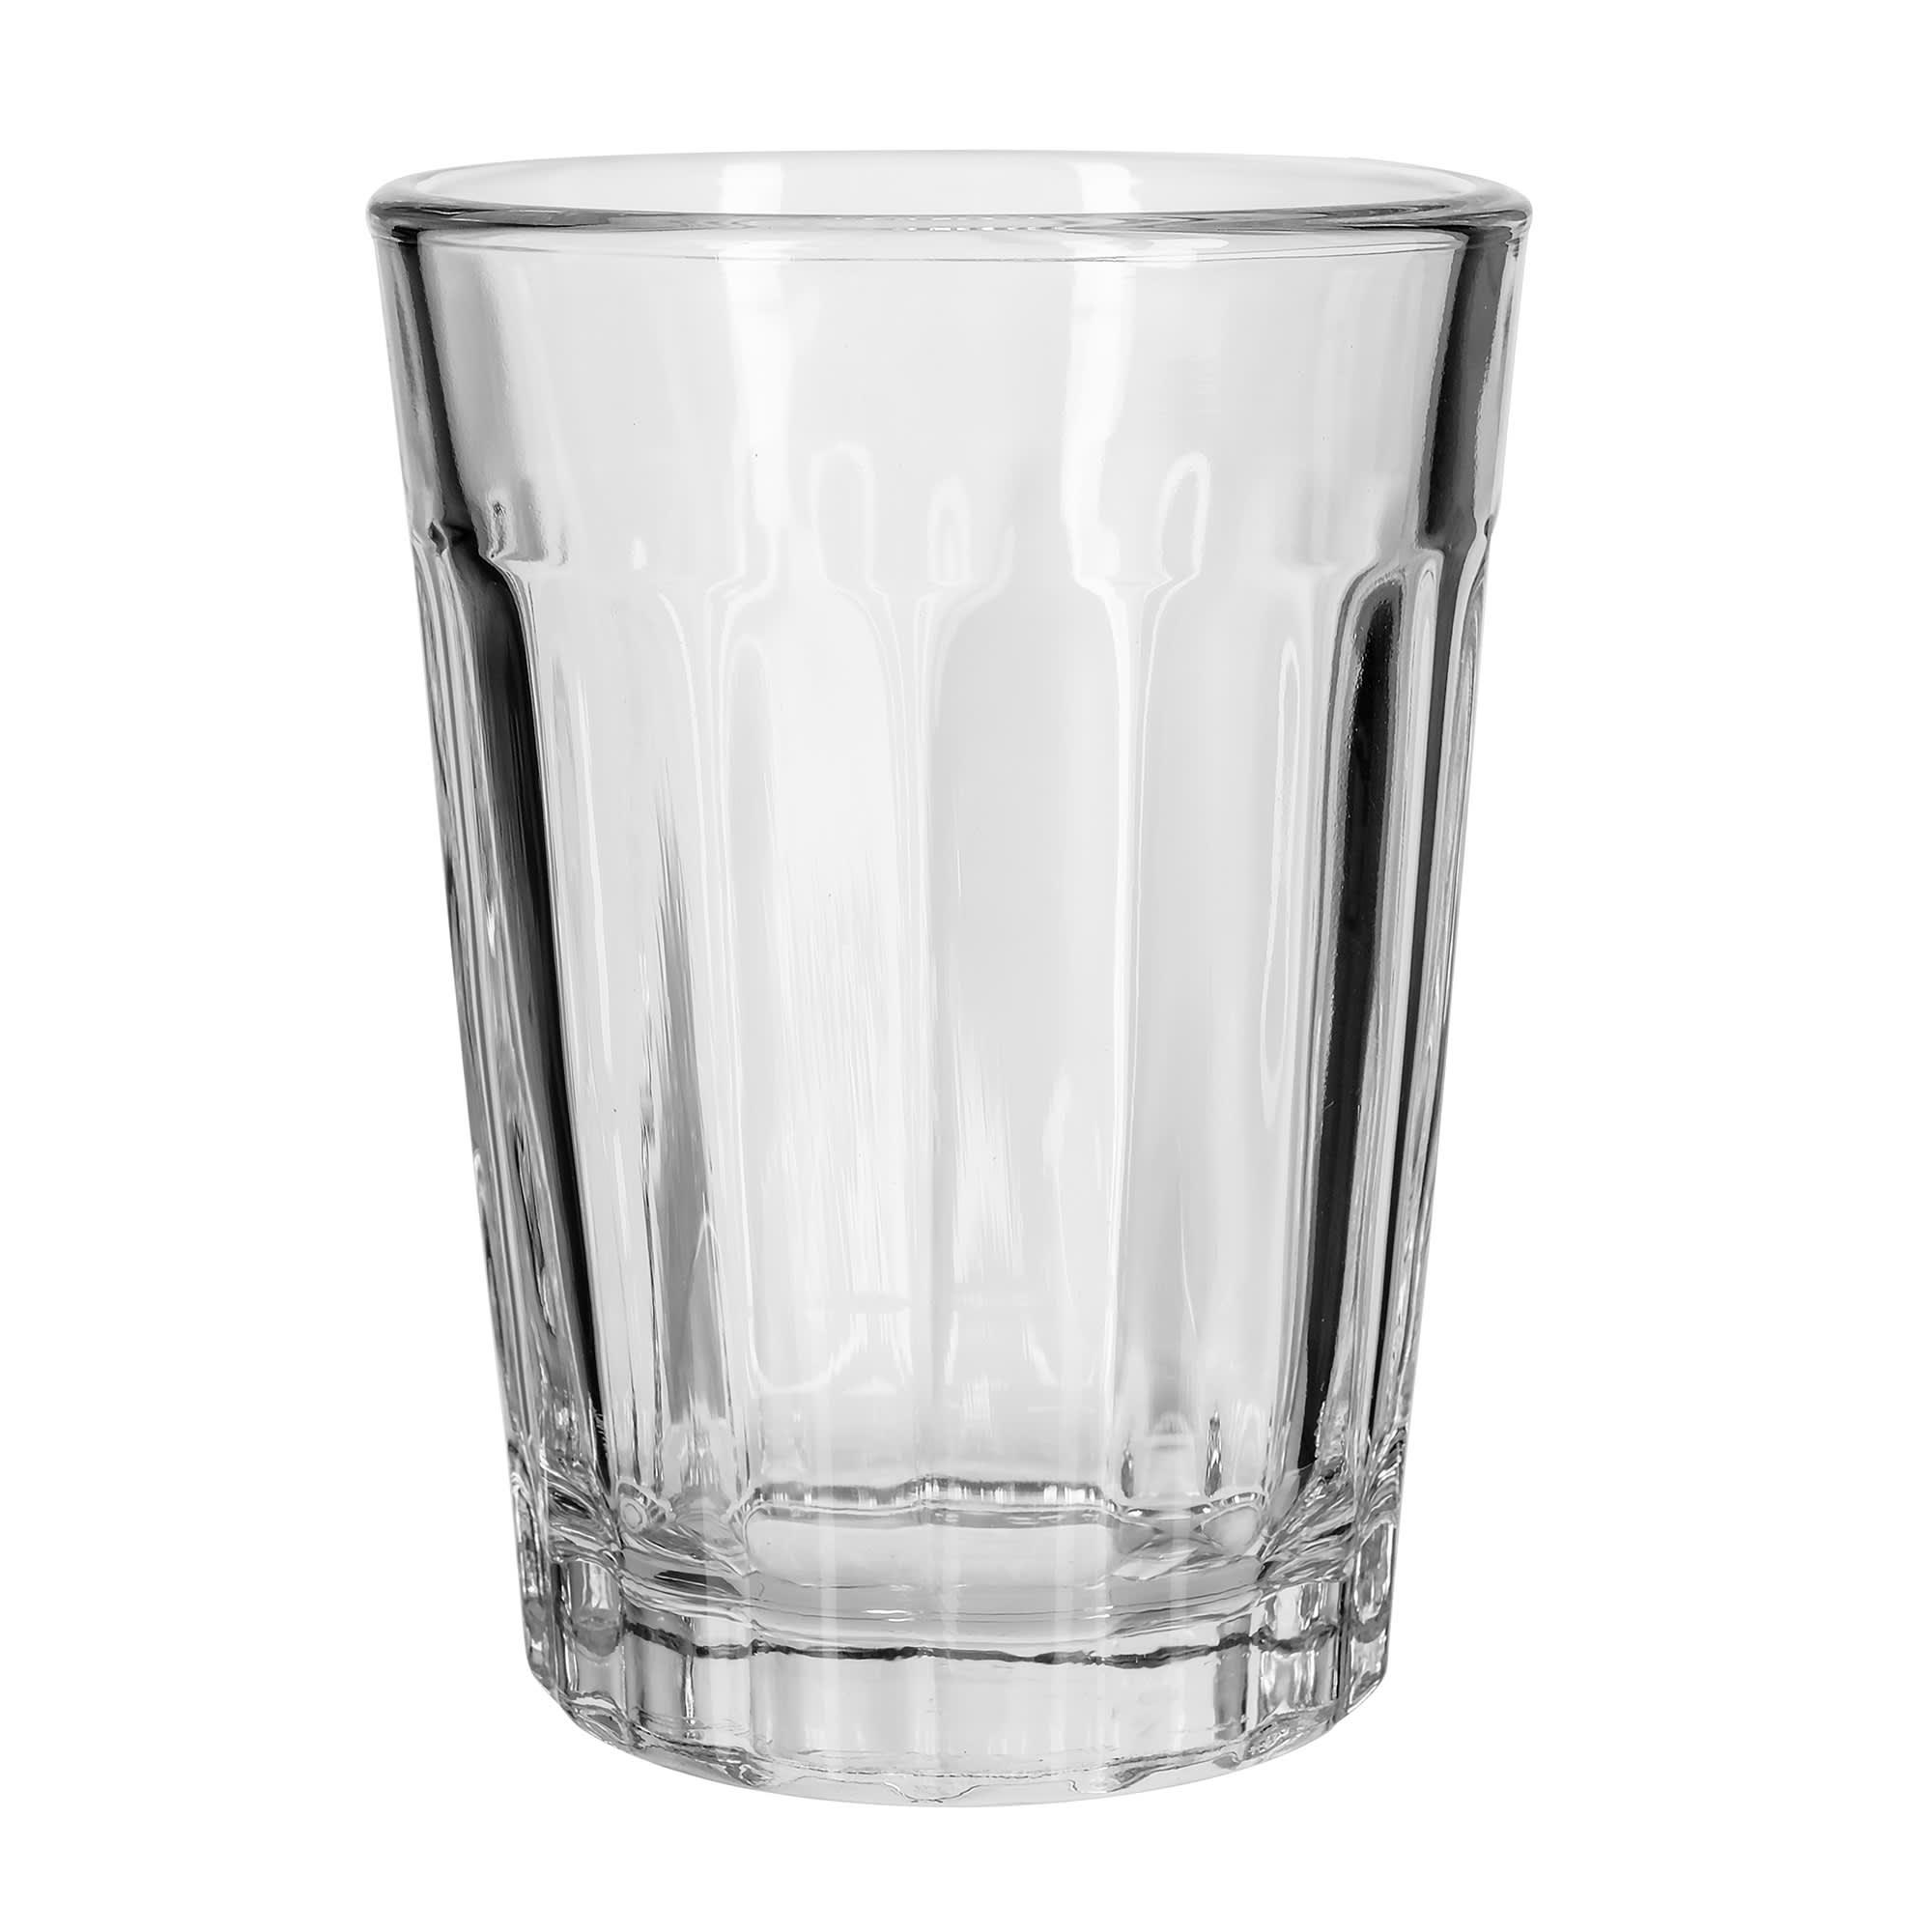 Libbey 15640 8.5-oz DuraTuff Paneled Glass Tumbler